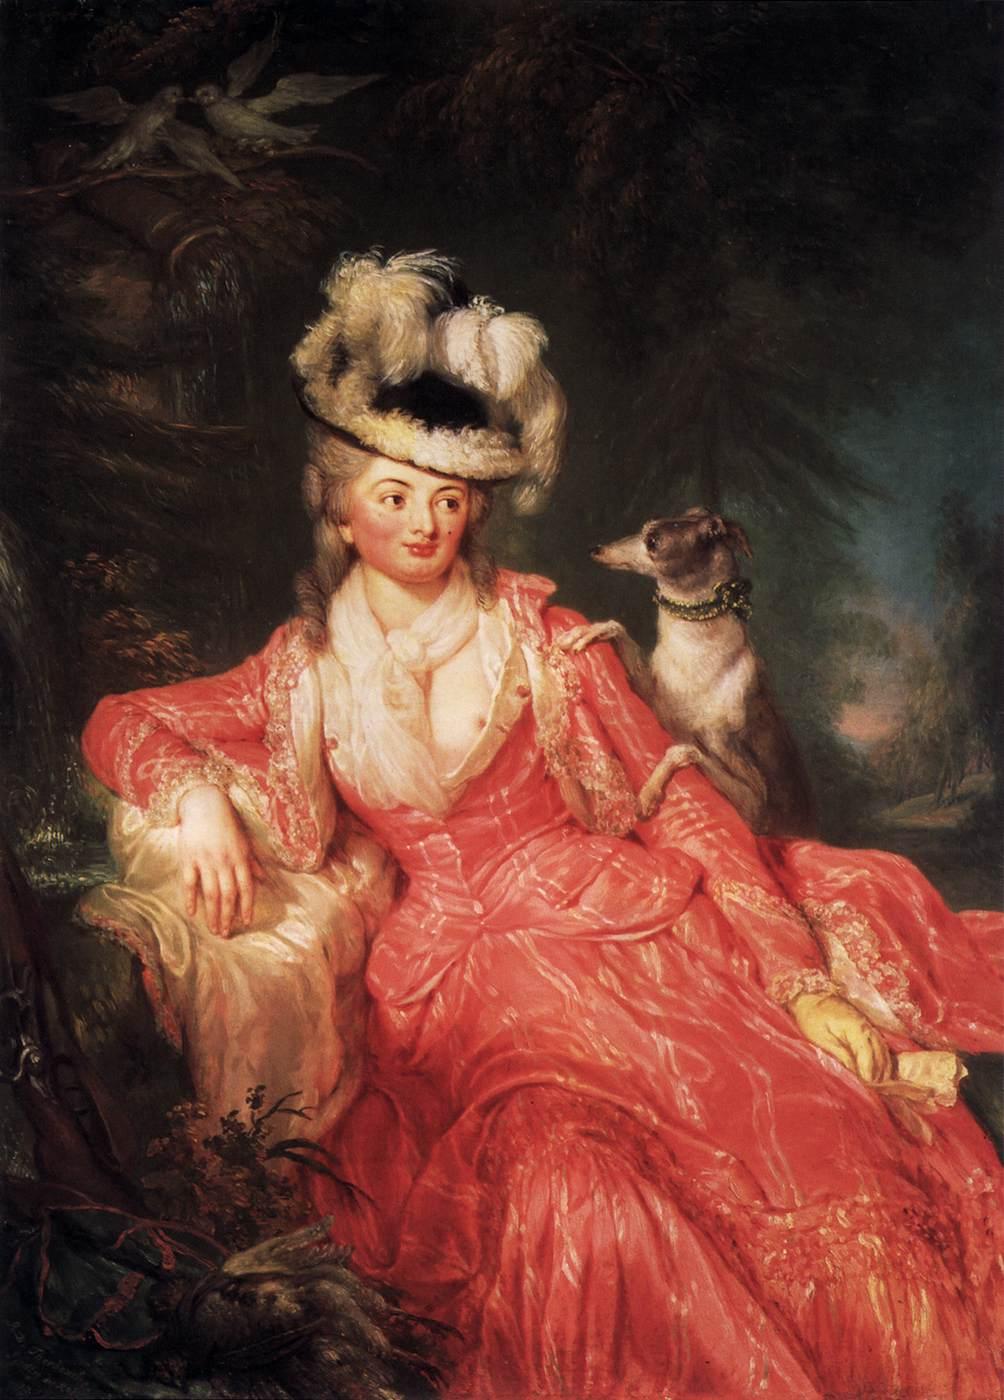 8fbb82634a0 A Seriously Naughty Portrait  Countess of Lichtenau